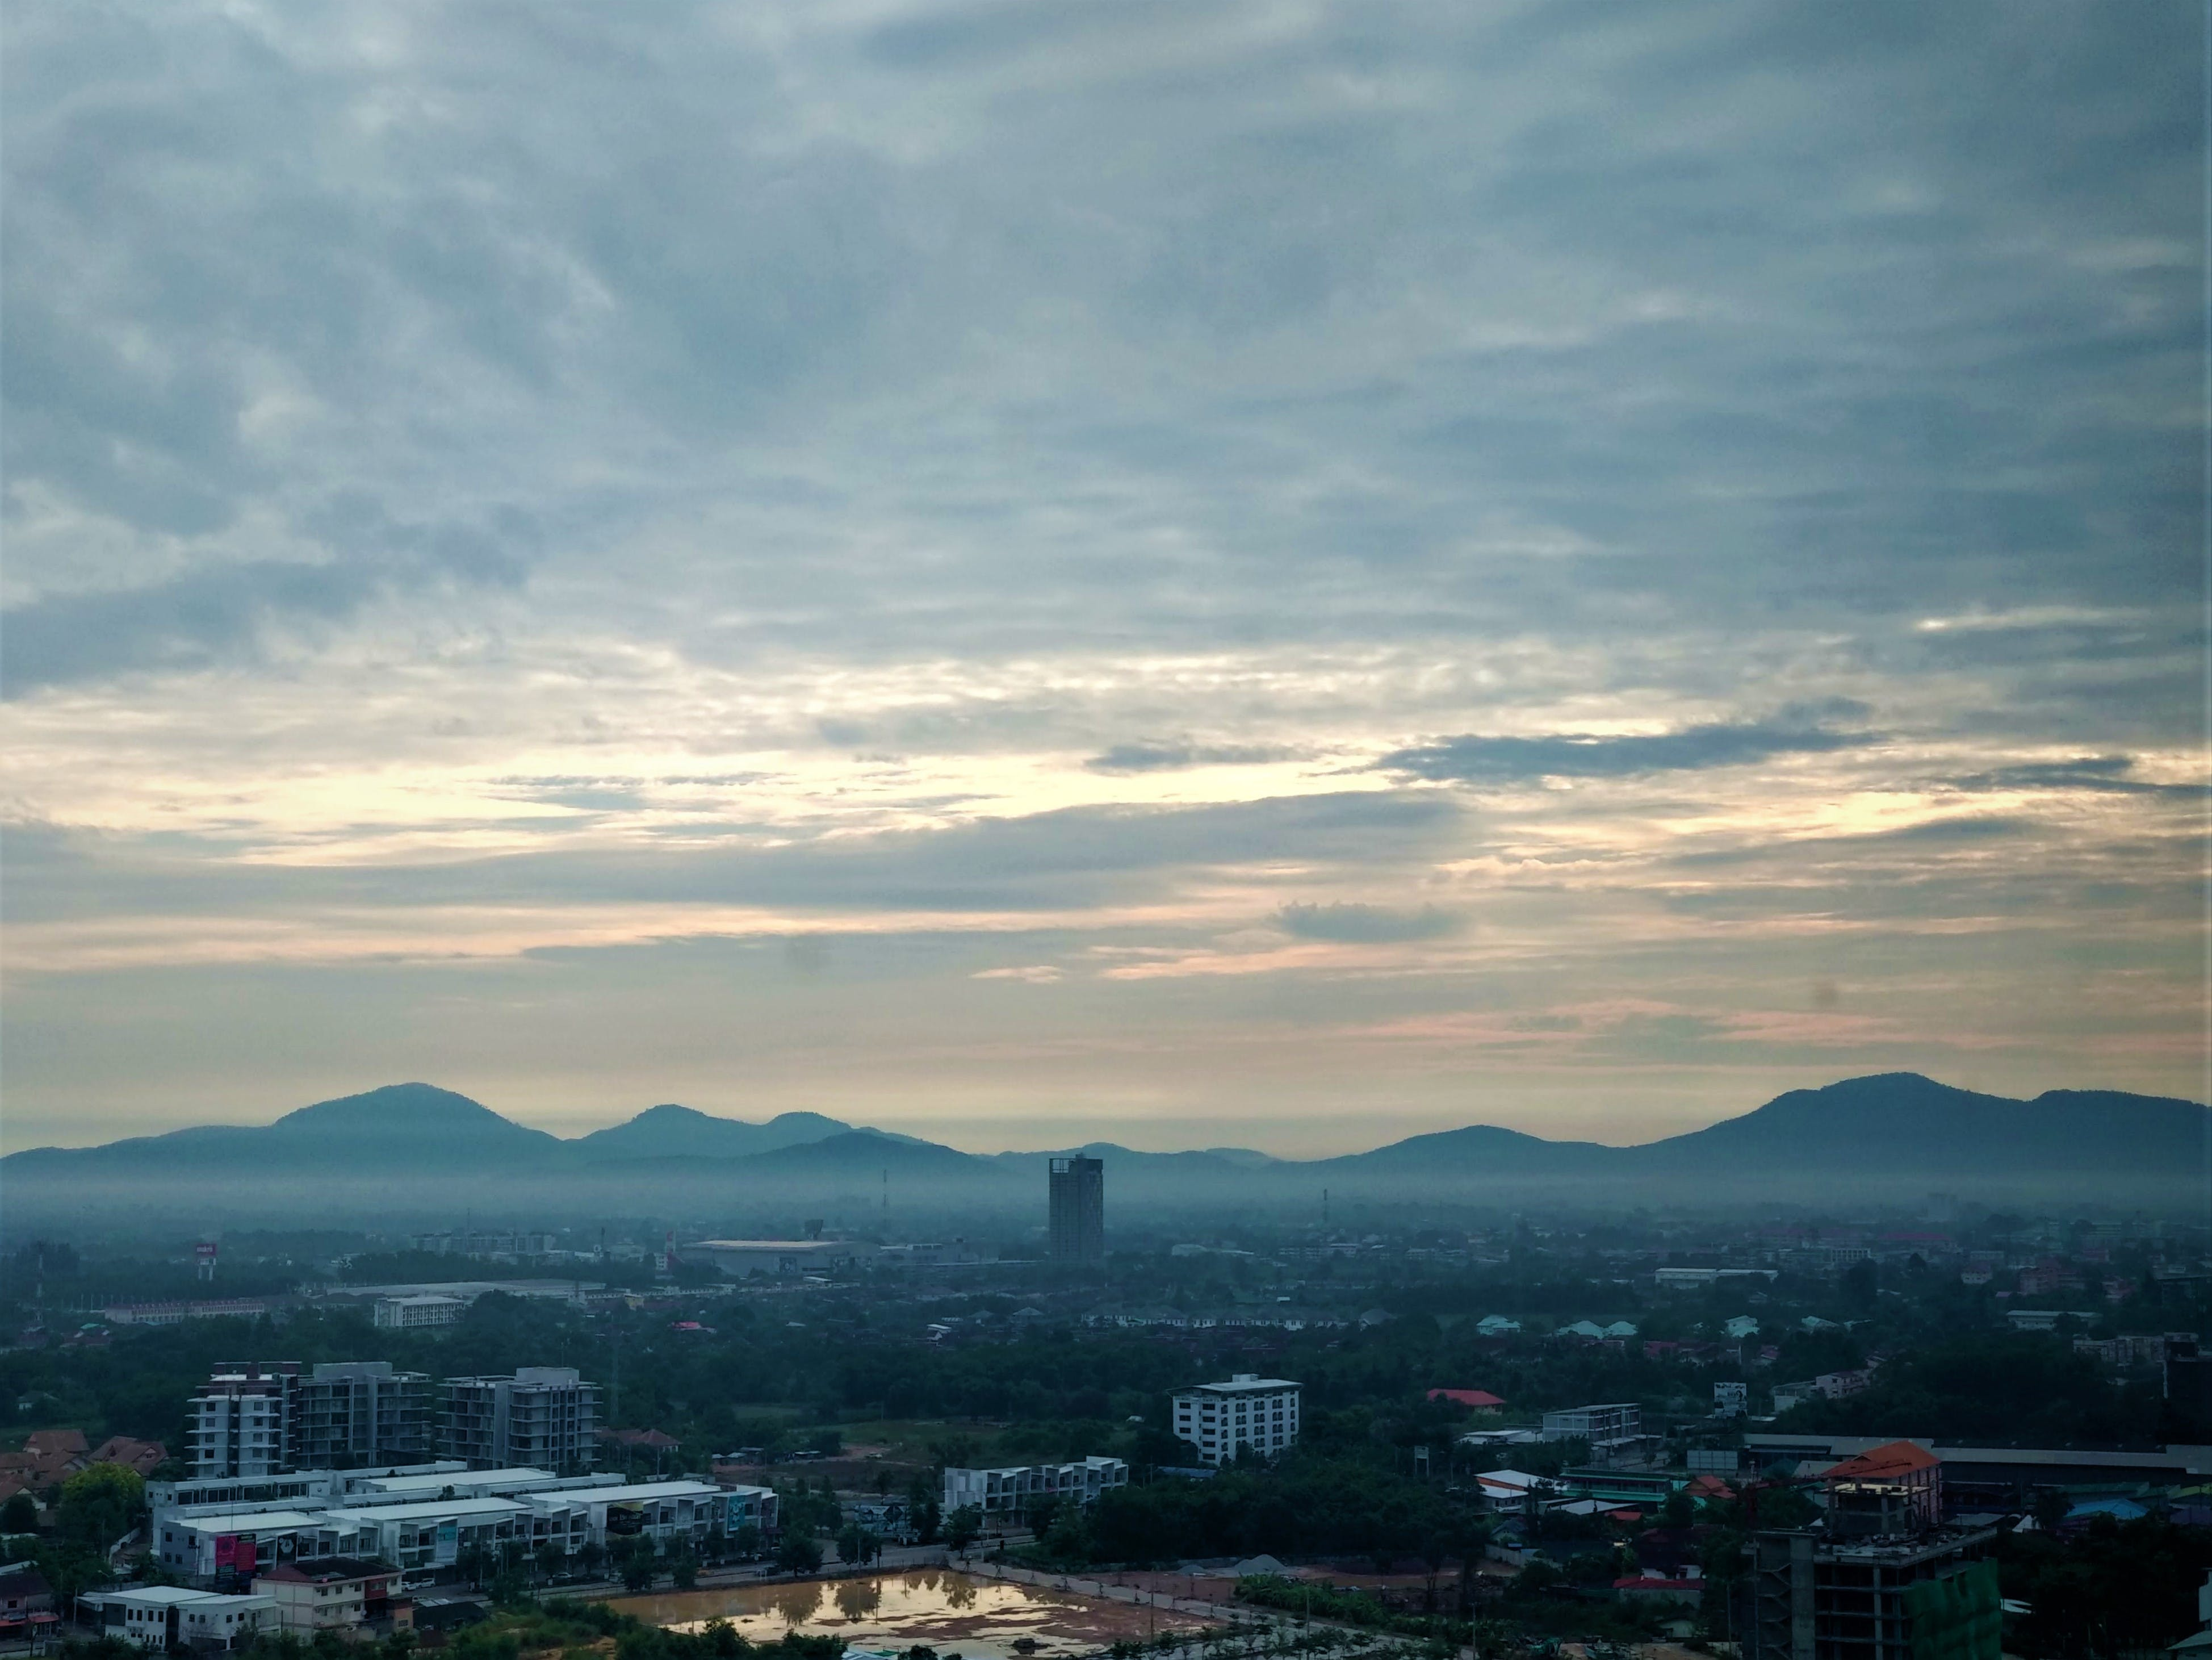 Free stock photo of blue sky, city, city scape, city view